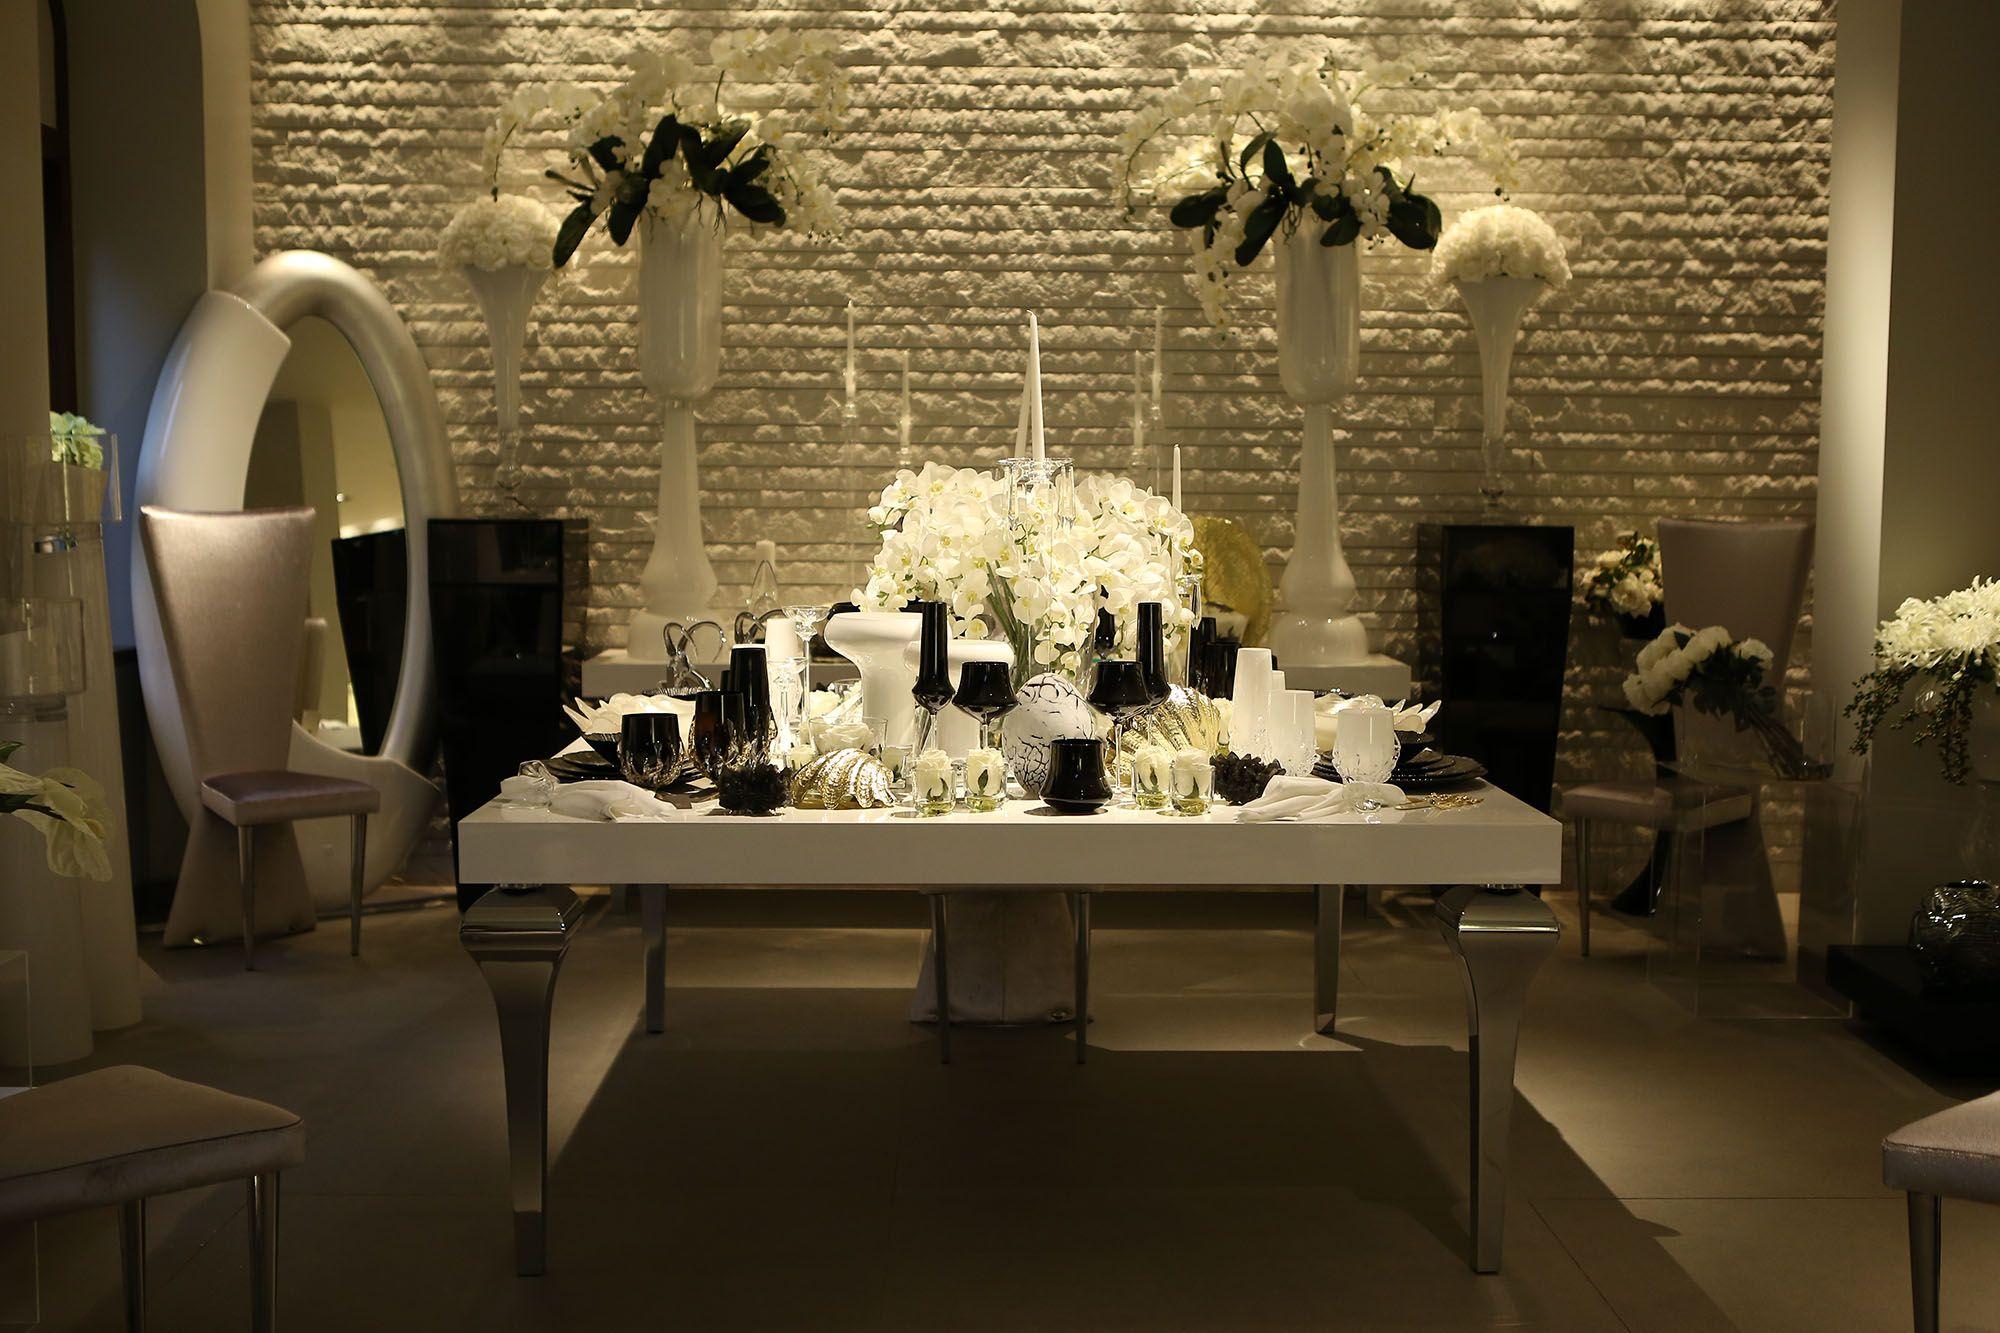 sofa set showroom in mumbai sure fit lexington t cushion slipcover blue simone arora 39s new store opening vg table